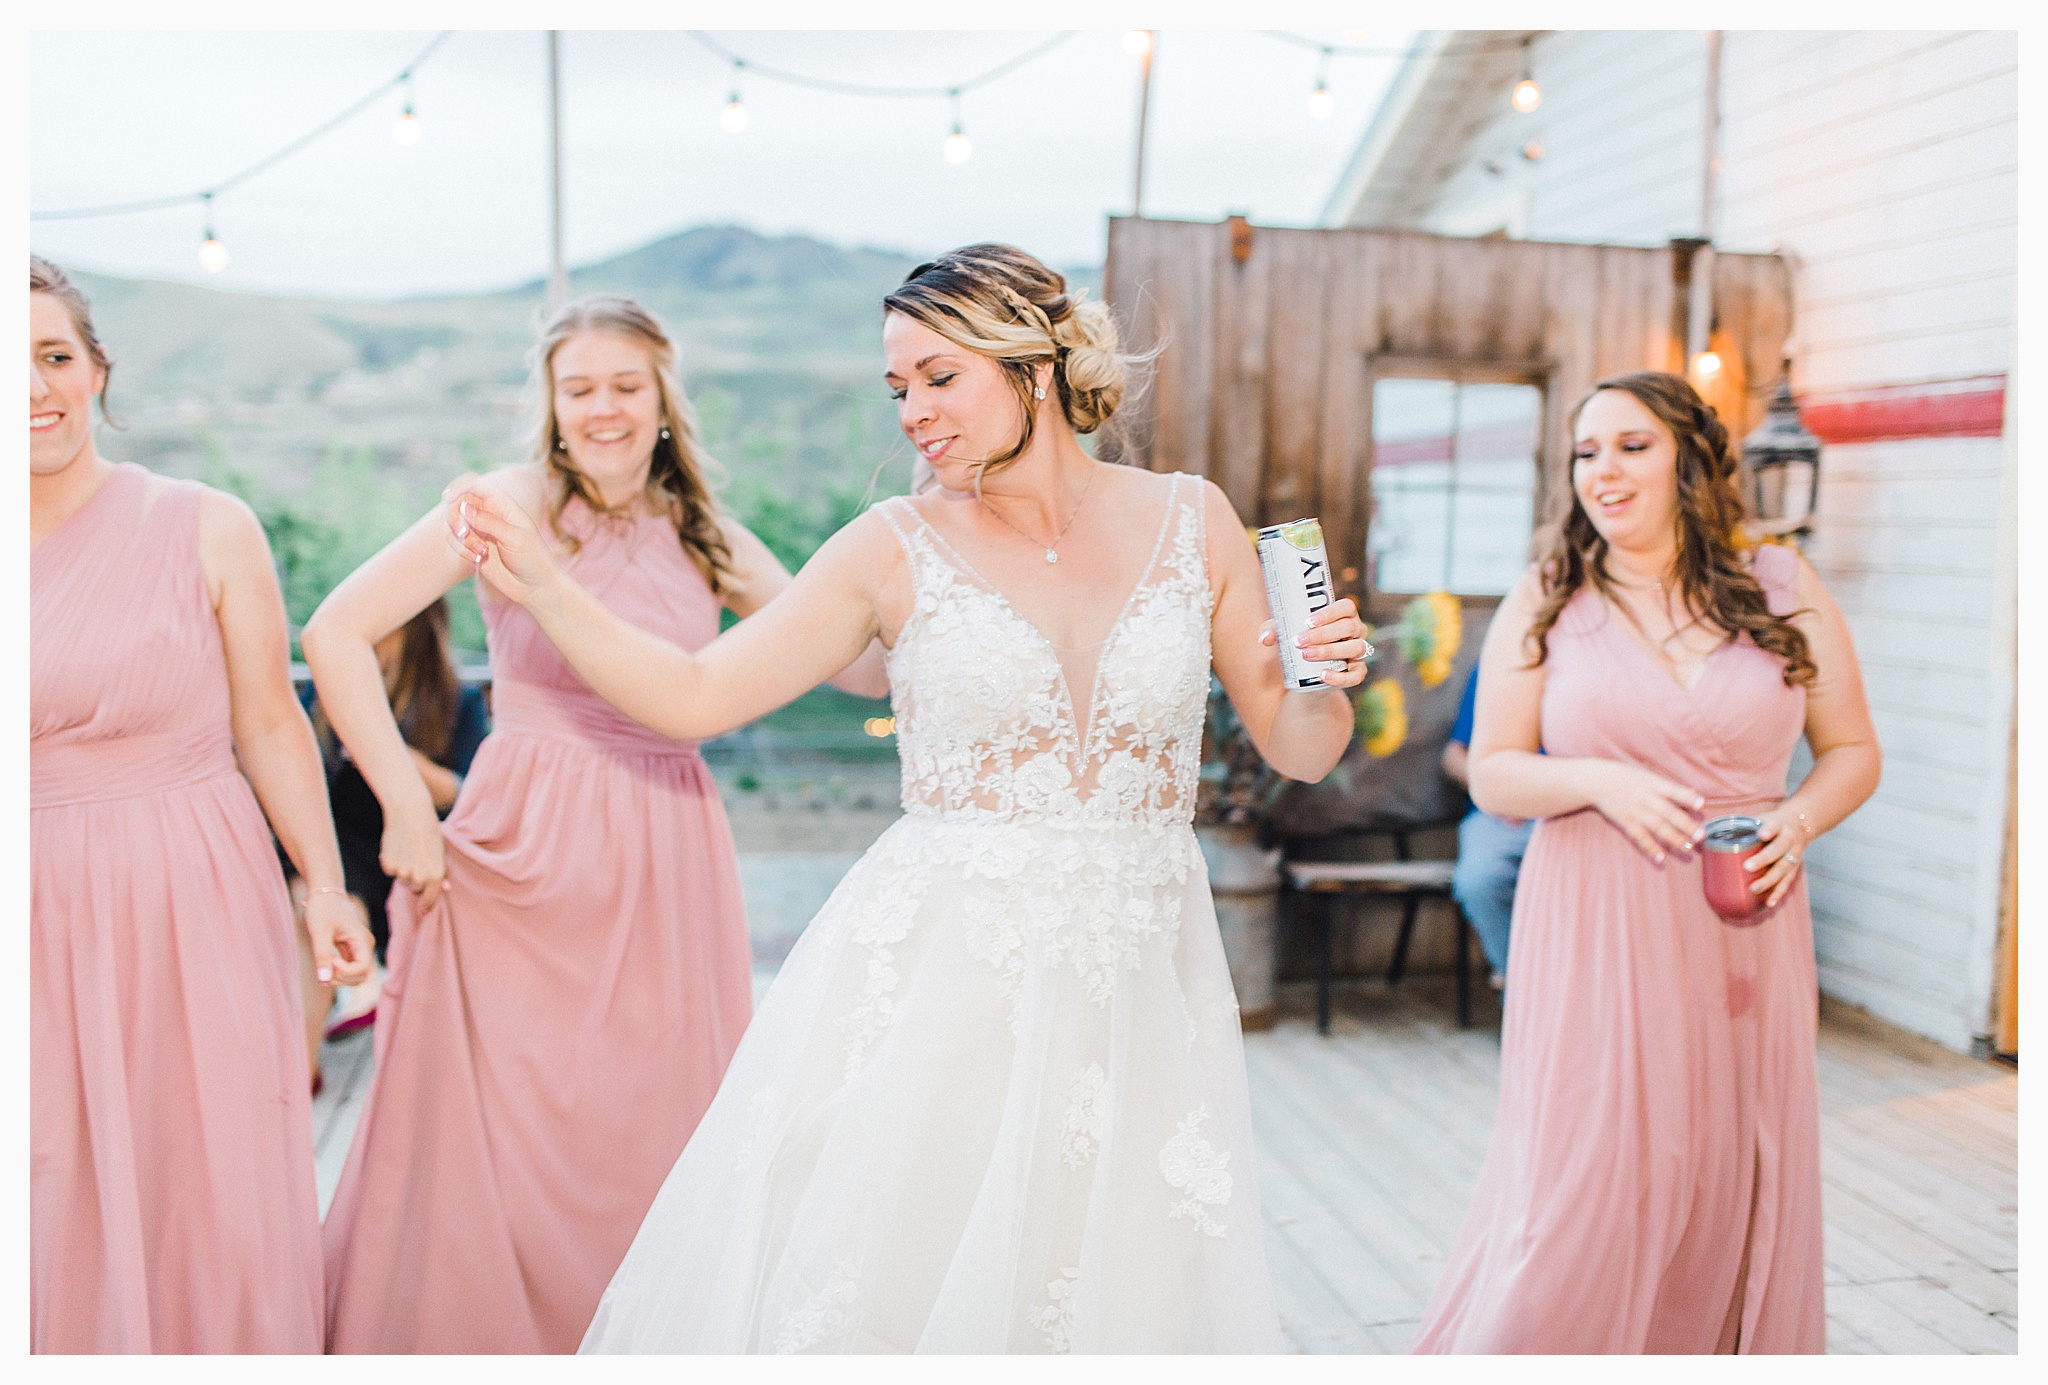 Rustic barn wedding in Wenatchee Washington at Sunshine Ranch on Easy Street, Emma Rose Company Seattle PNW Light and Airy Wedding Photographer_0118.jpg